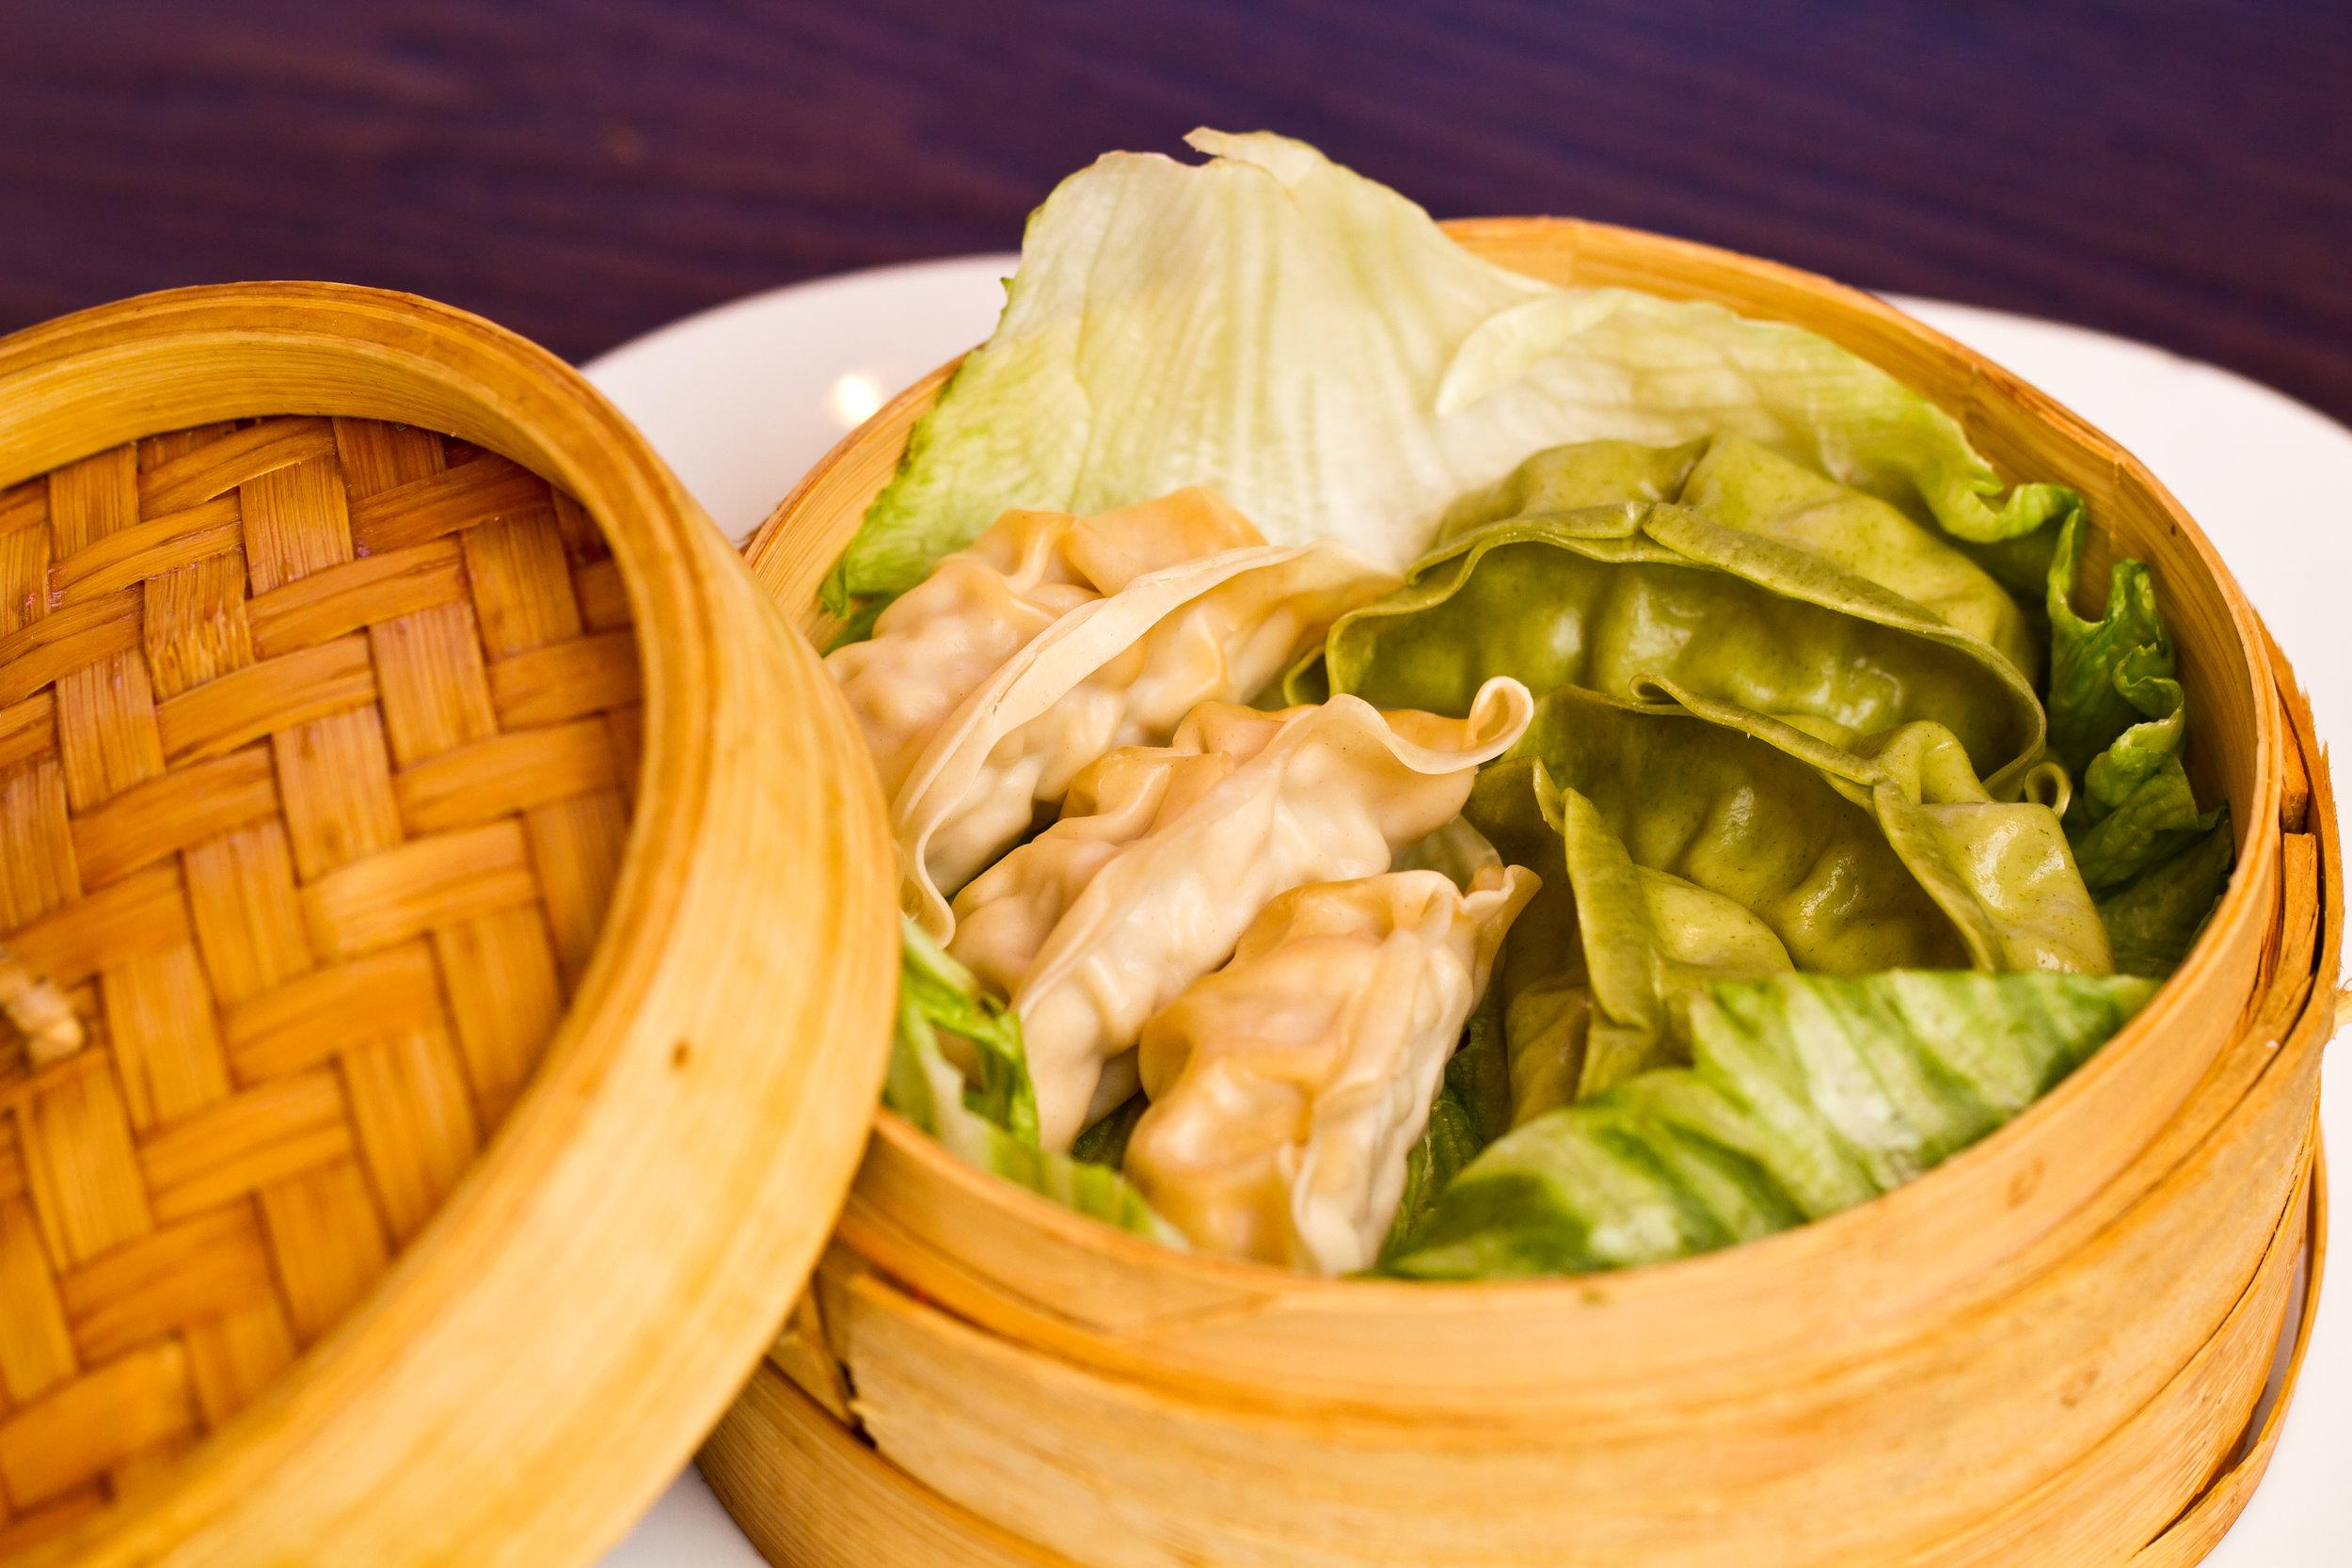 Steamed Dumplings – Jasmine Asian House, Collegeville, PA